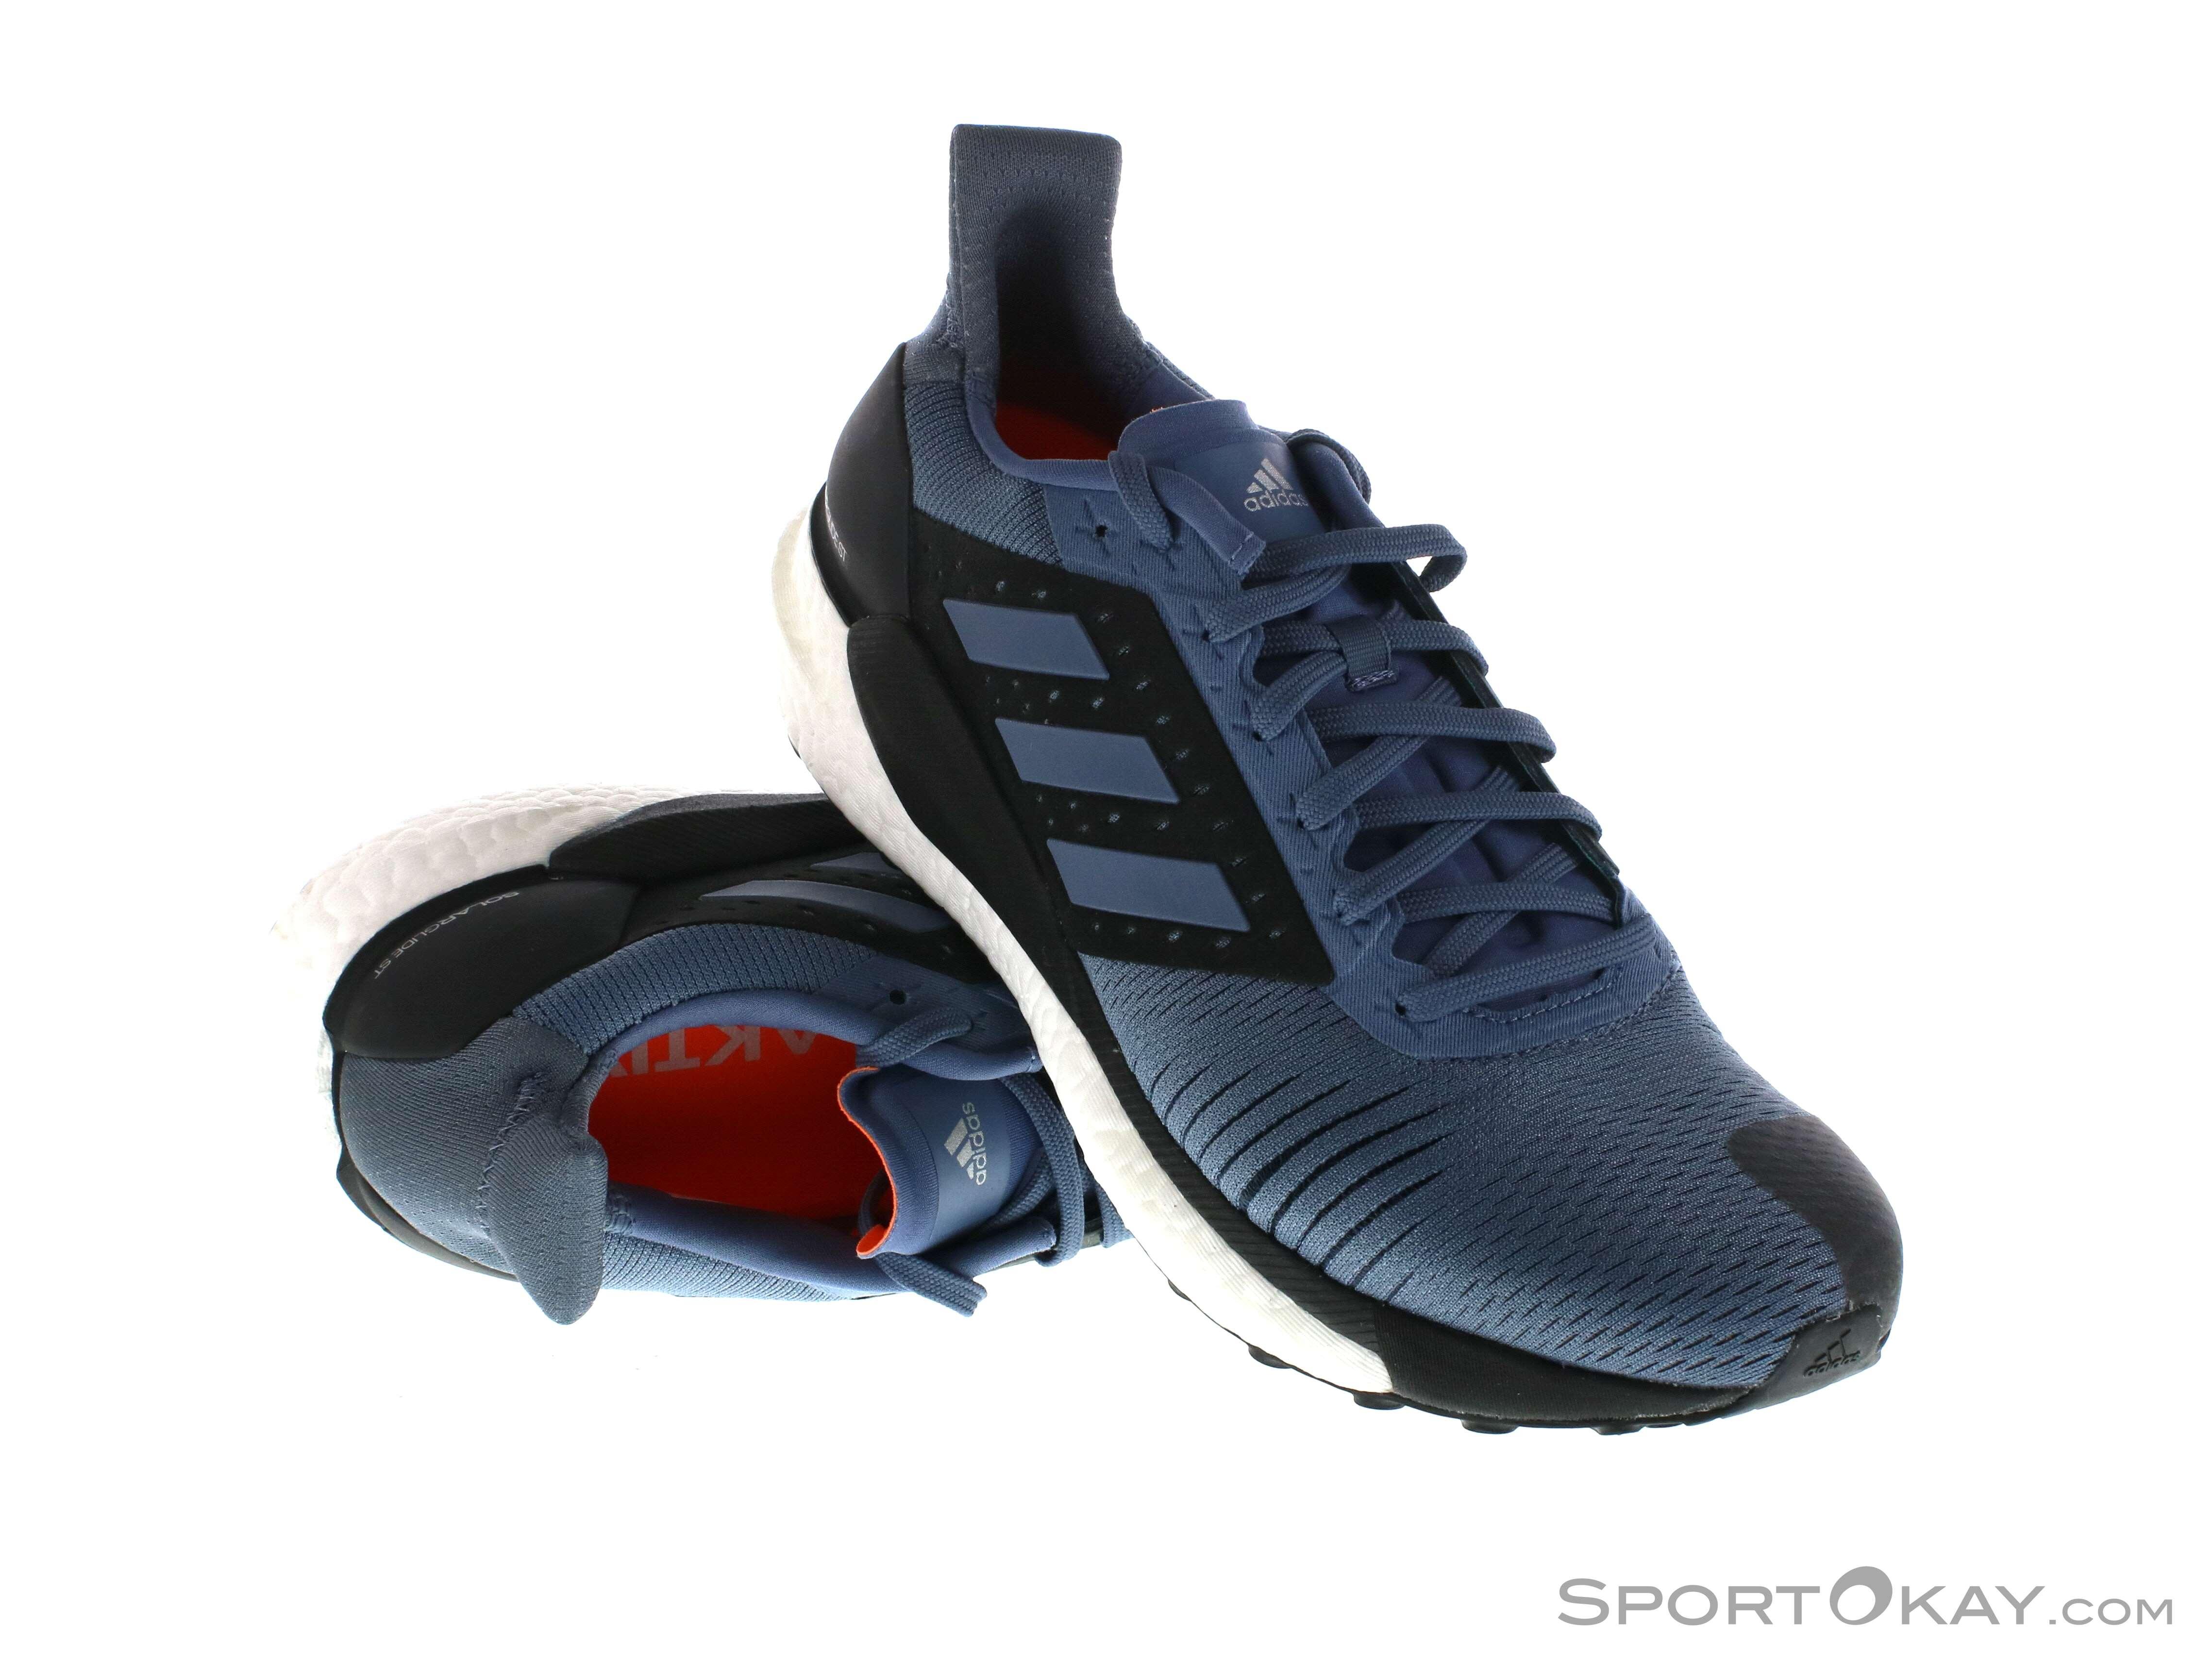 reputable site cd50f 8fd16 adidas adidas Solar Glide ST Mens Running Shoes